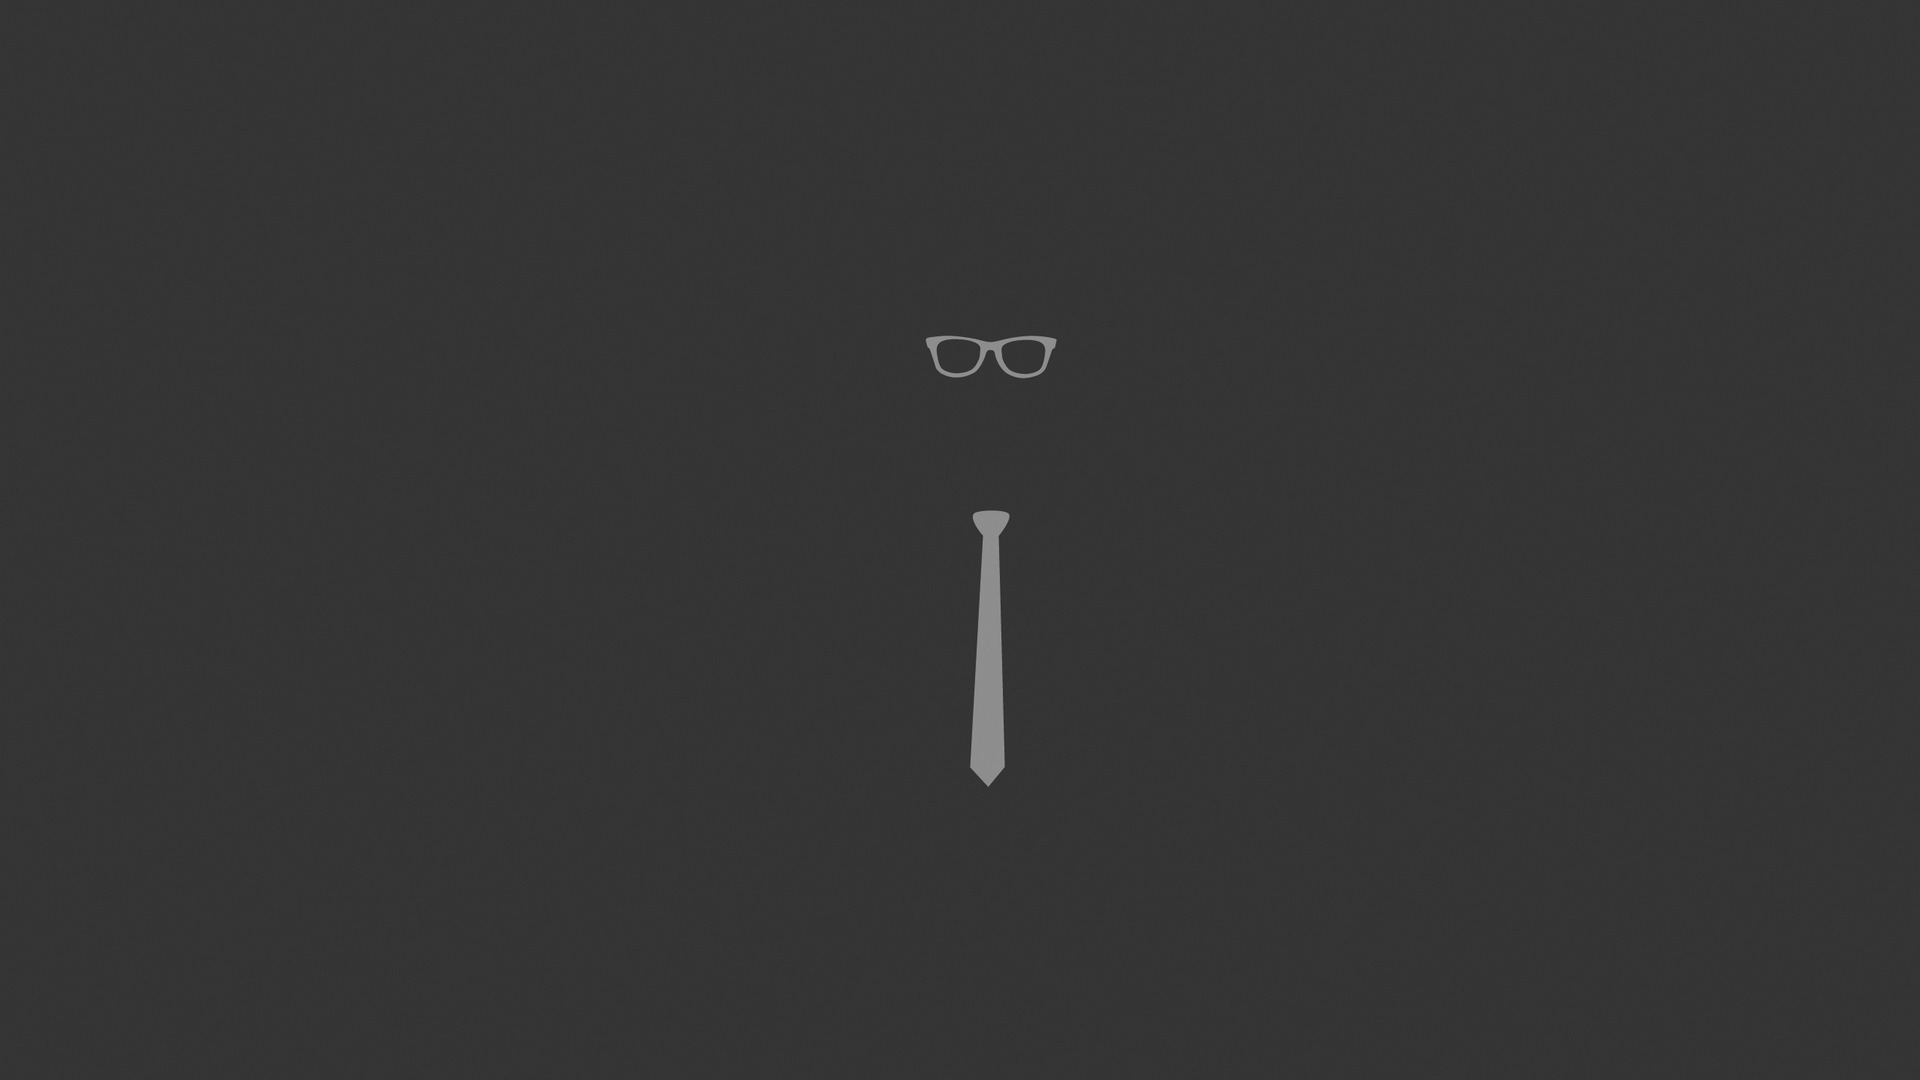 Simple Backgrounds free download | PixelsTalk Net